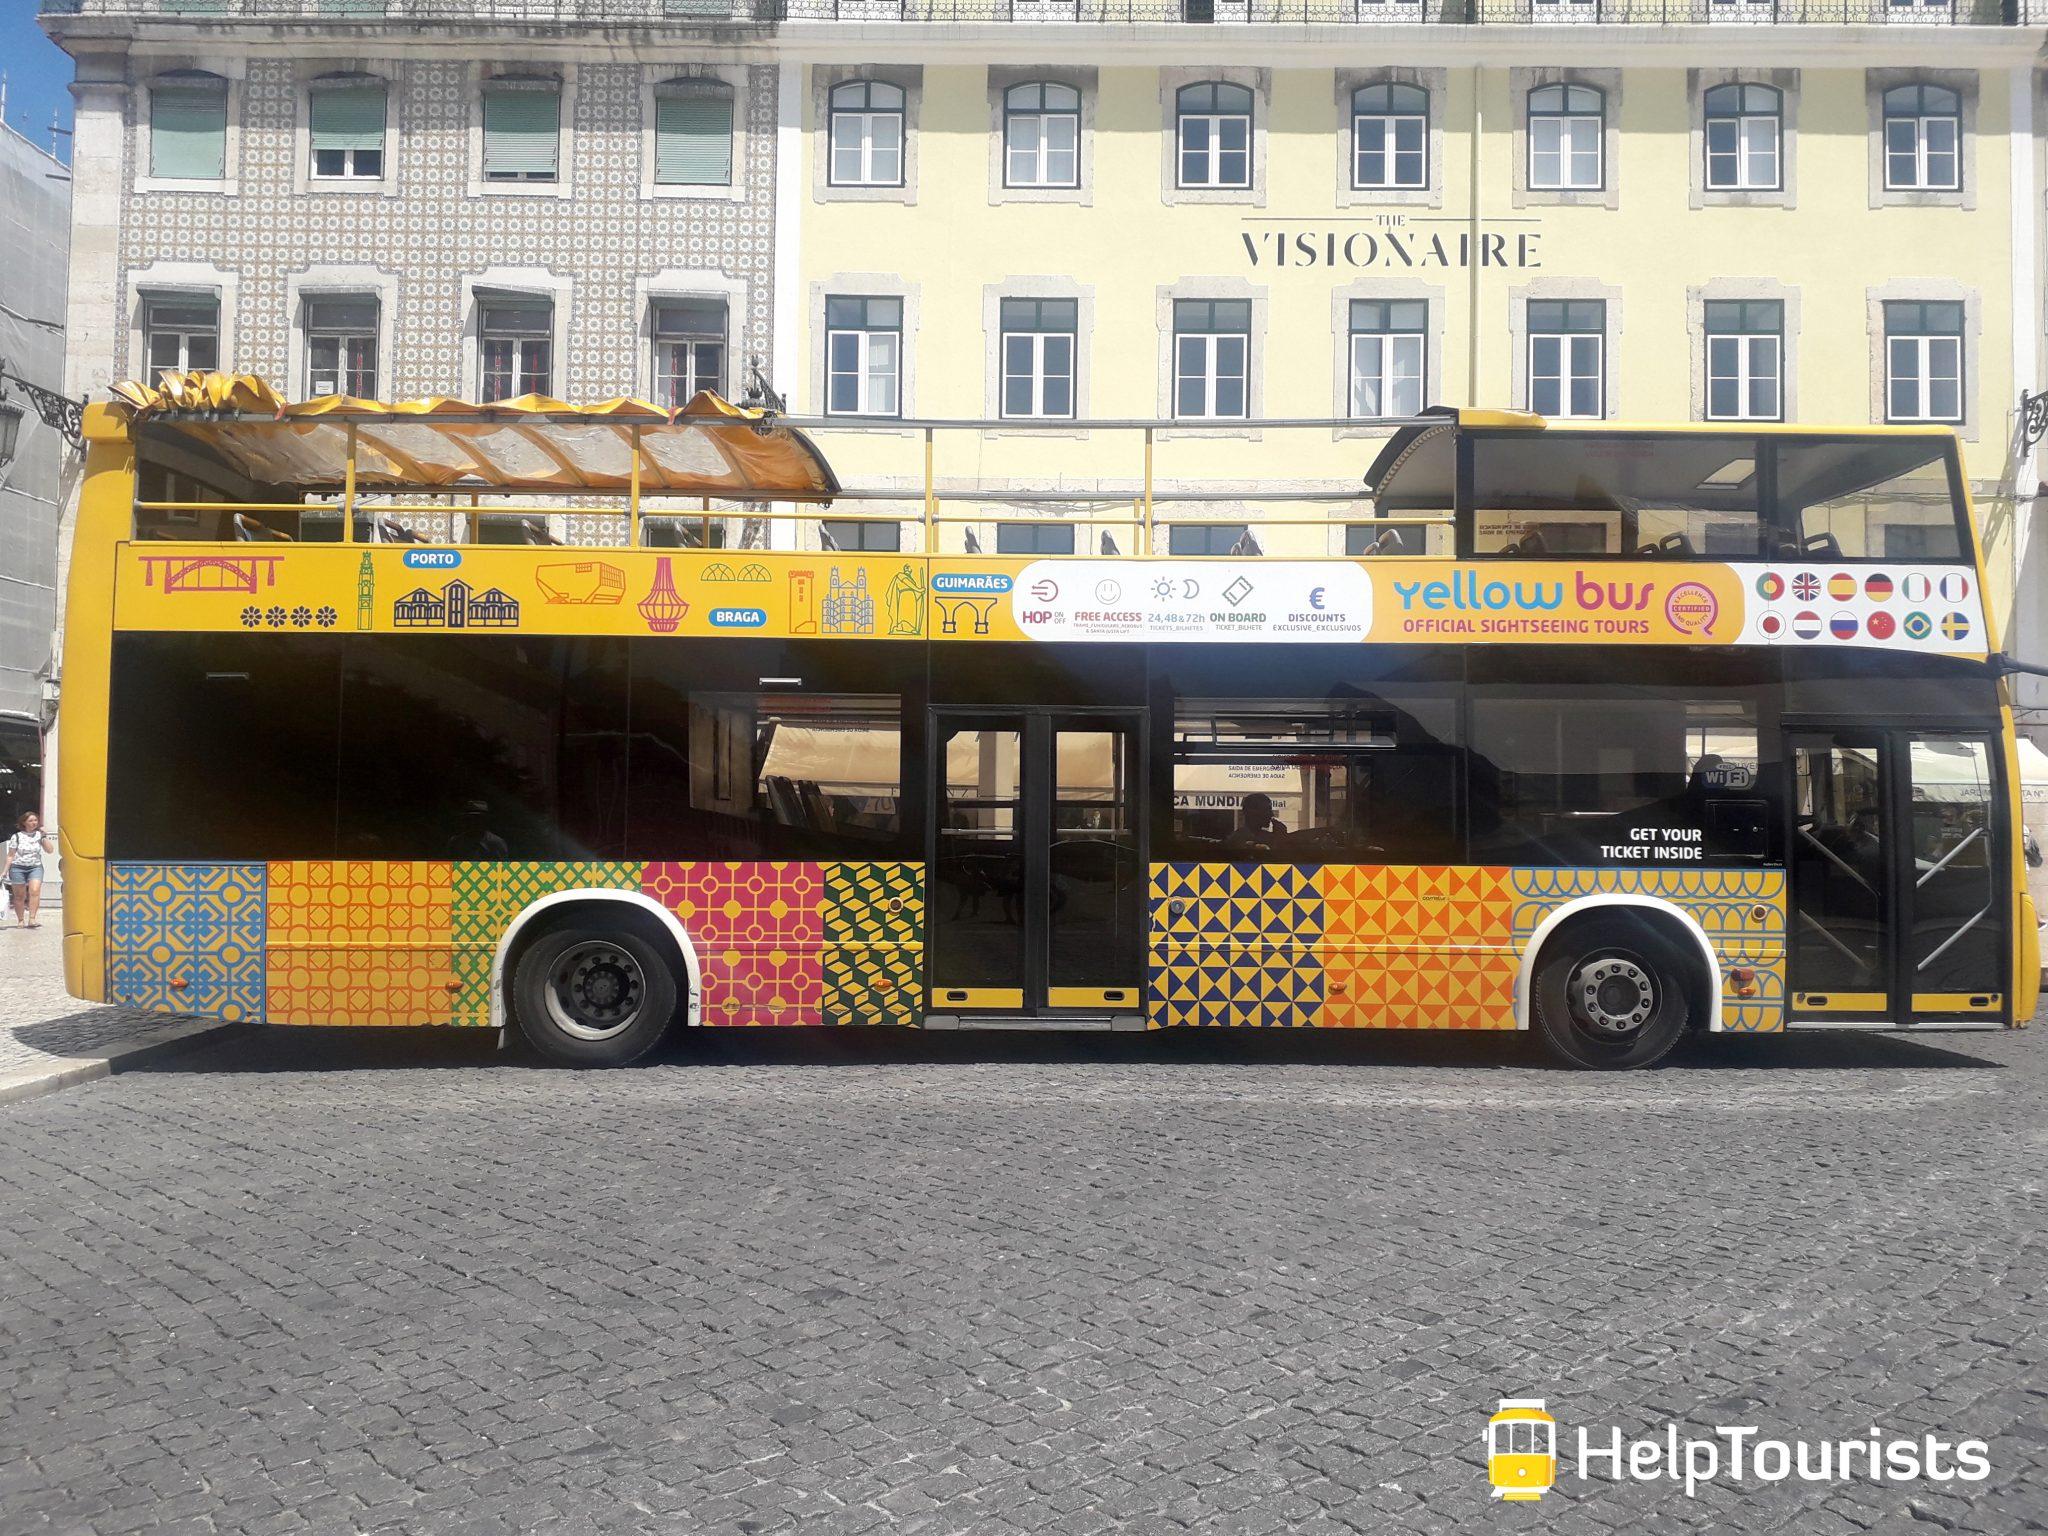 Lisbonne yellow bus hop on hop off